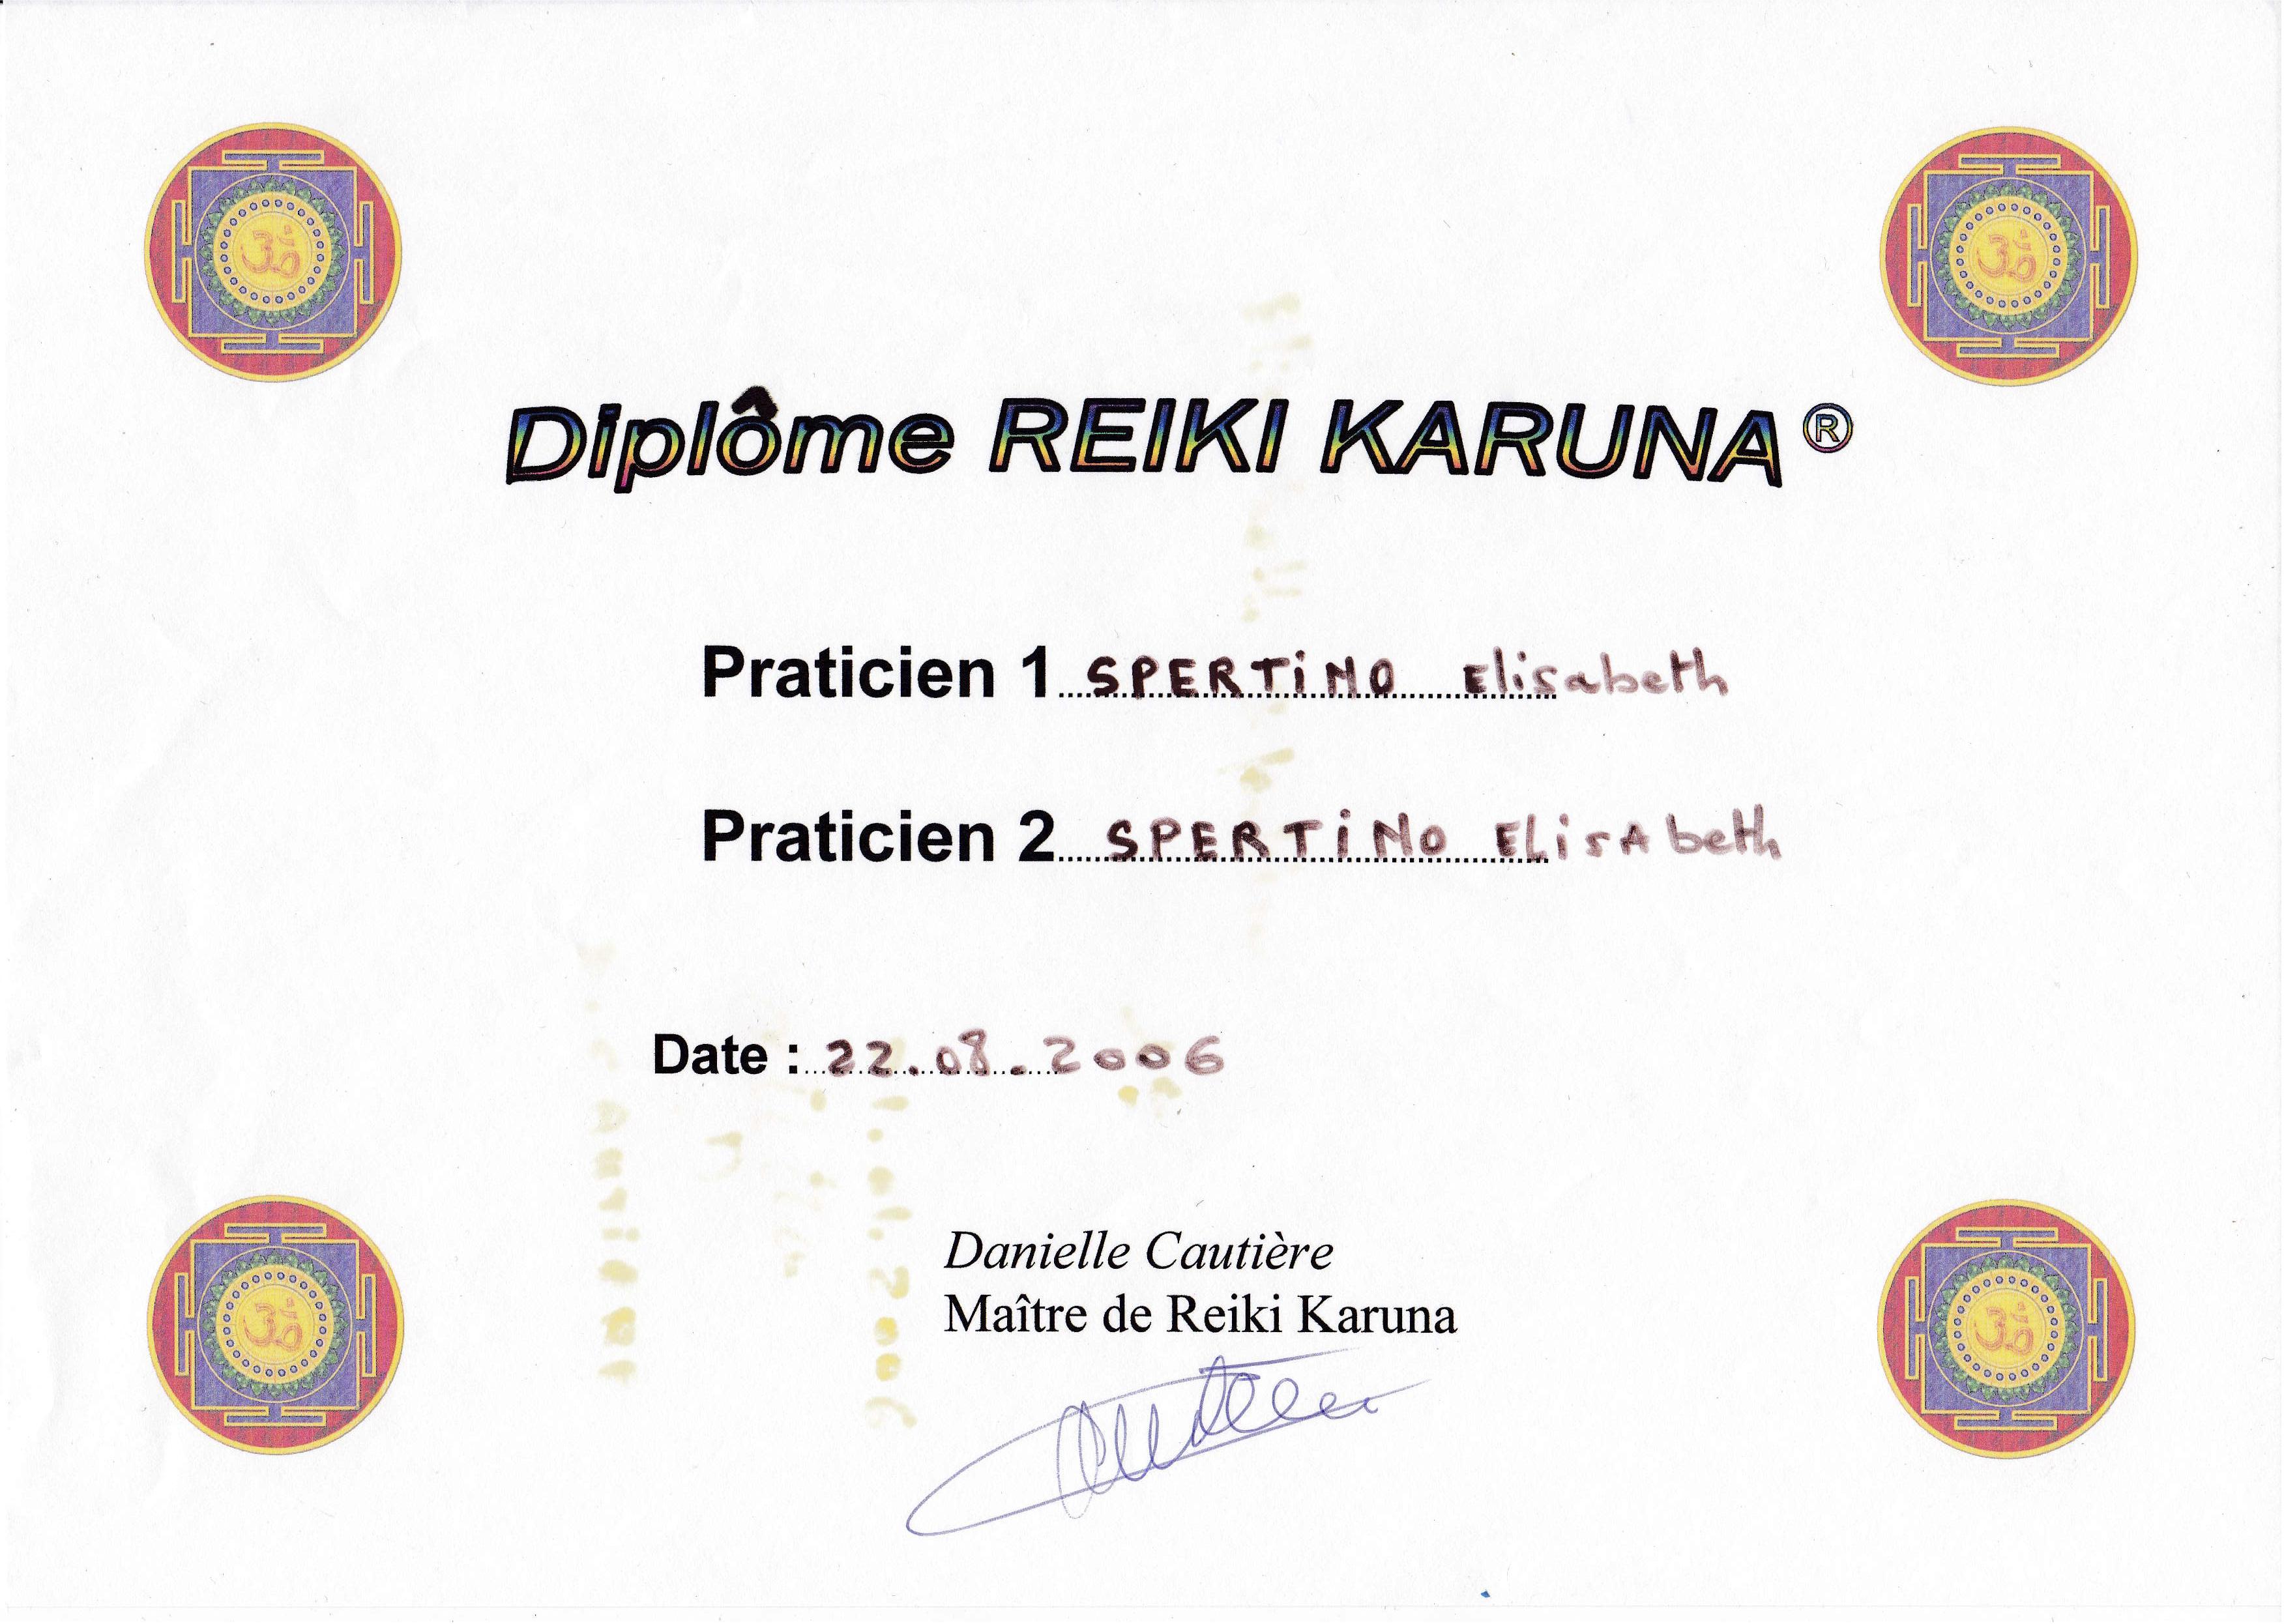 Paticien Réïki Karuna 2 dégrés